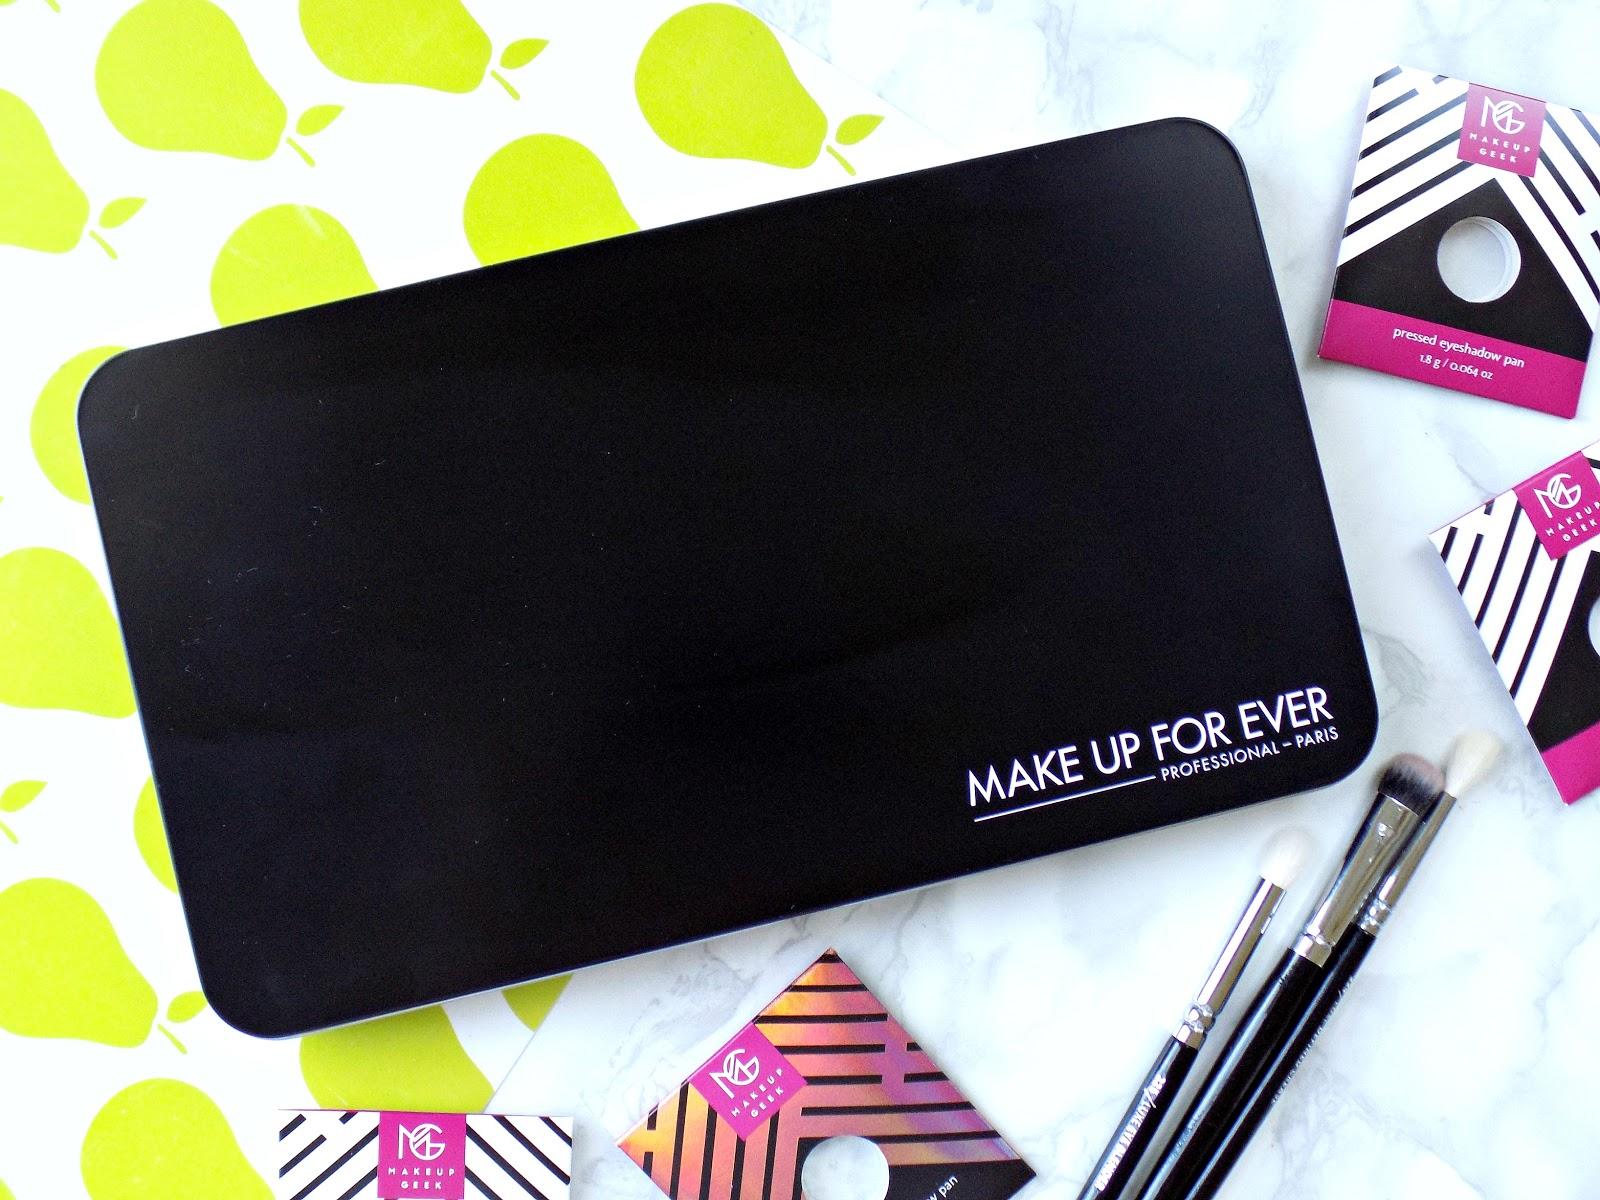 Makeup Geek eyeshadows, my collection